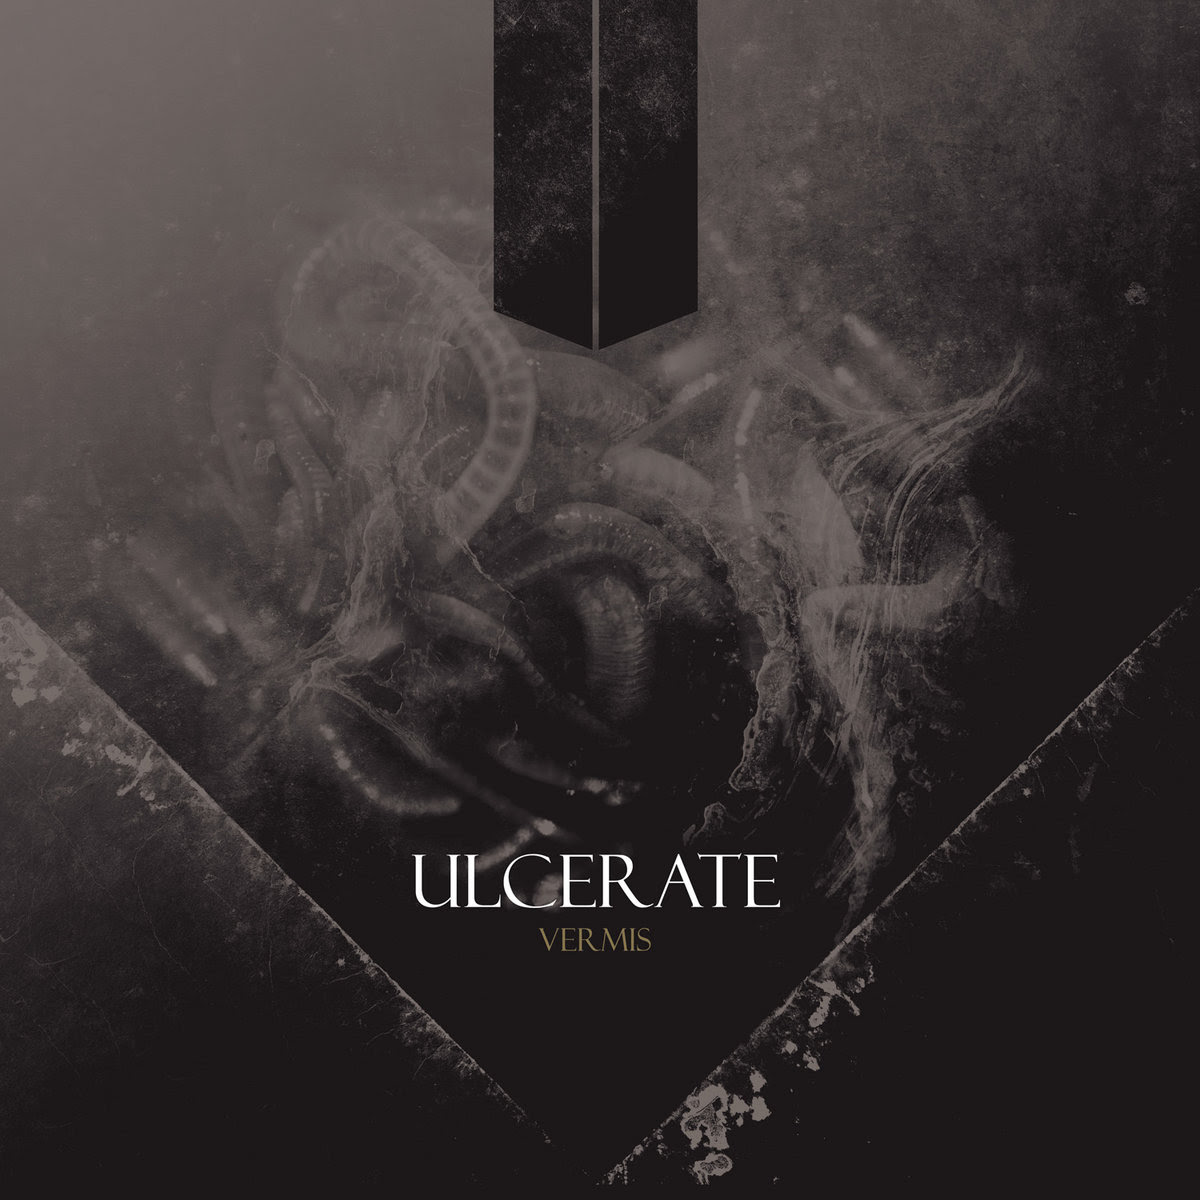 Ulcerate - Vermis (2013)